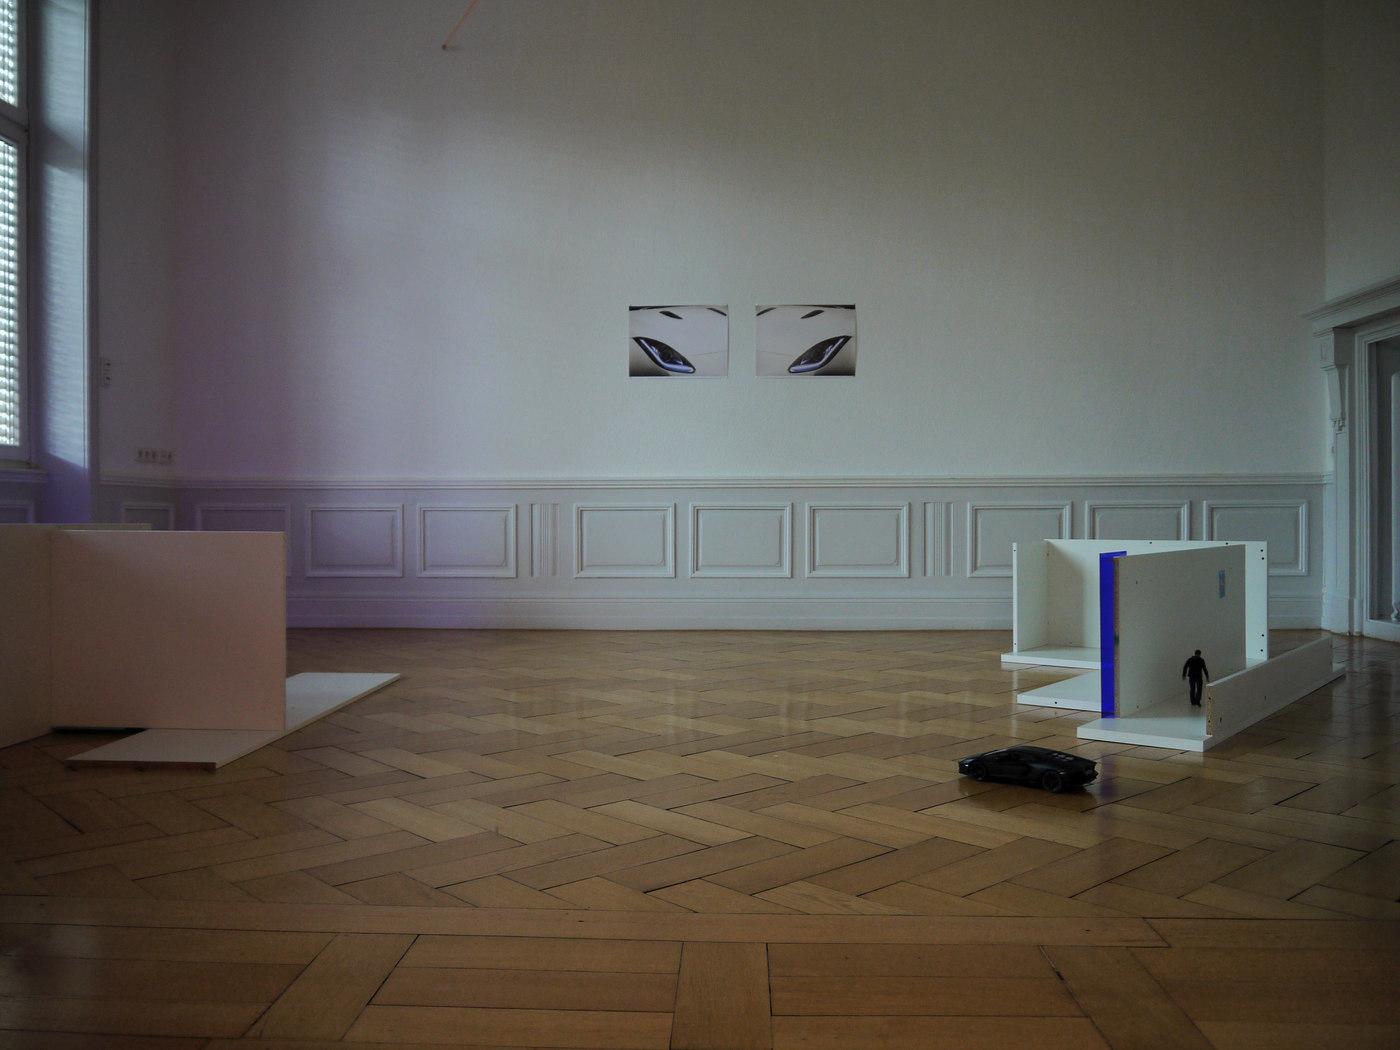 Salon Kennedy_PITFALLS_Benedikte Bjerre_Money over World_Frankfurt_Cultural Avenue_C